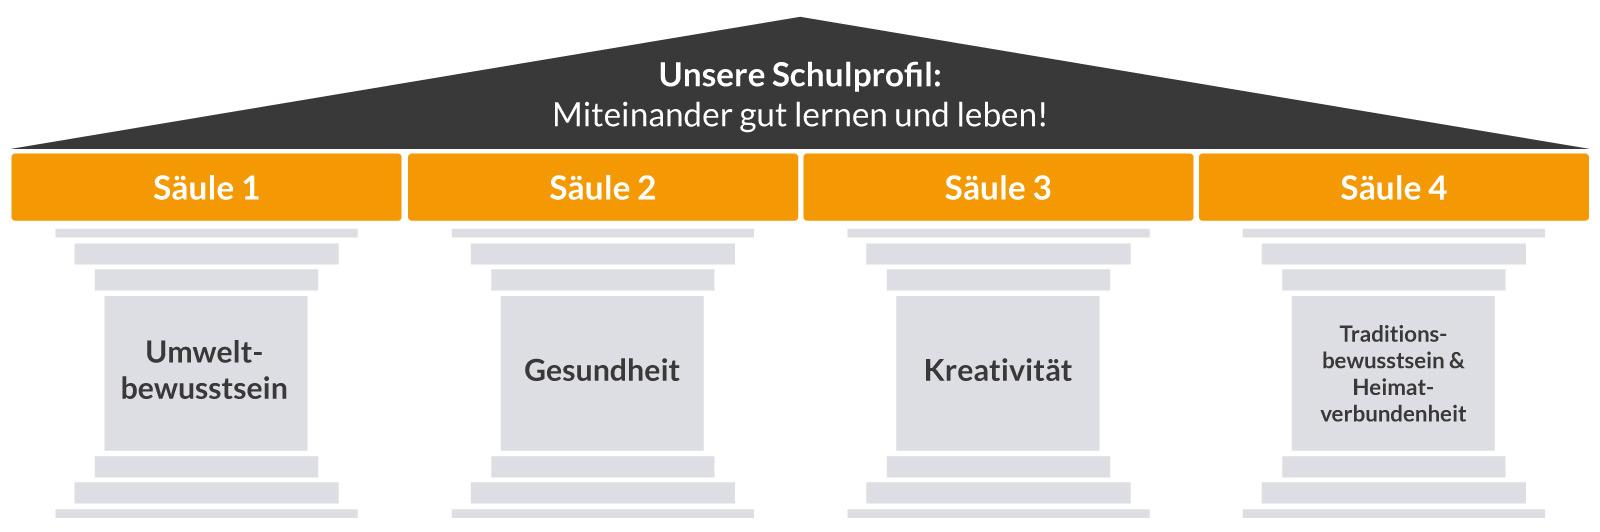 Schulfprofil-Grundschule Ammerthal